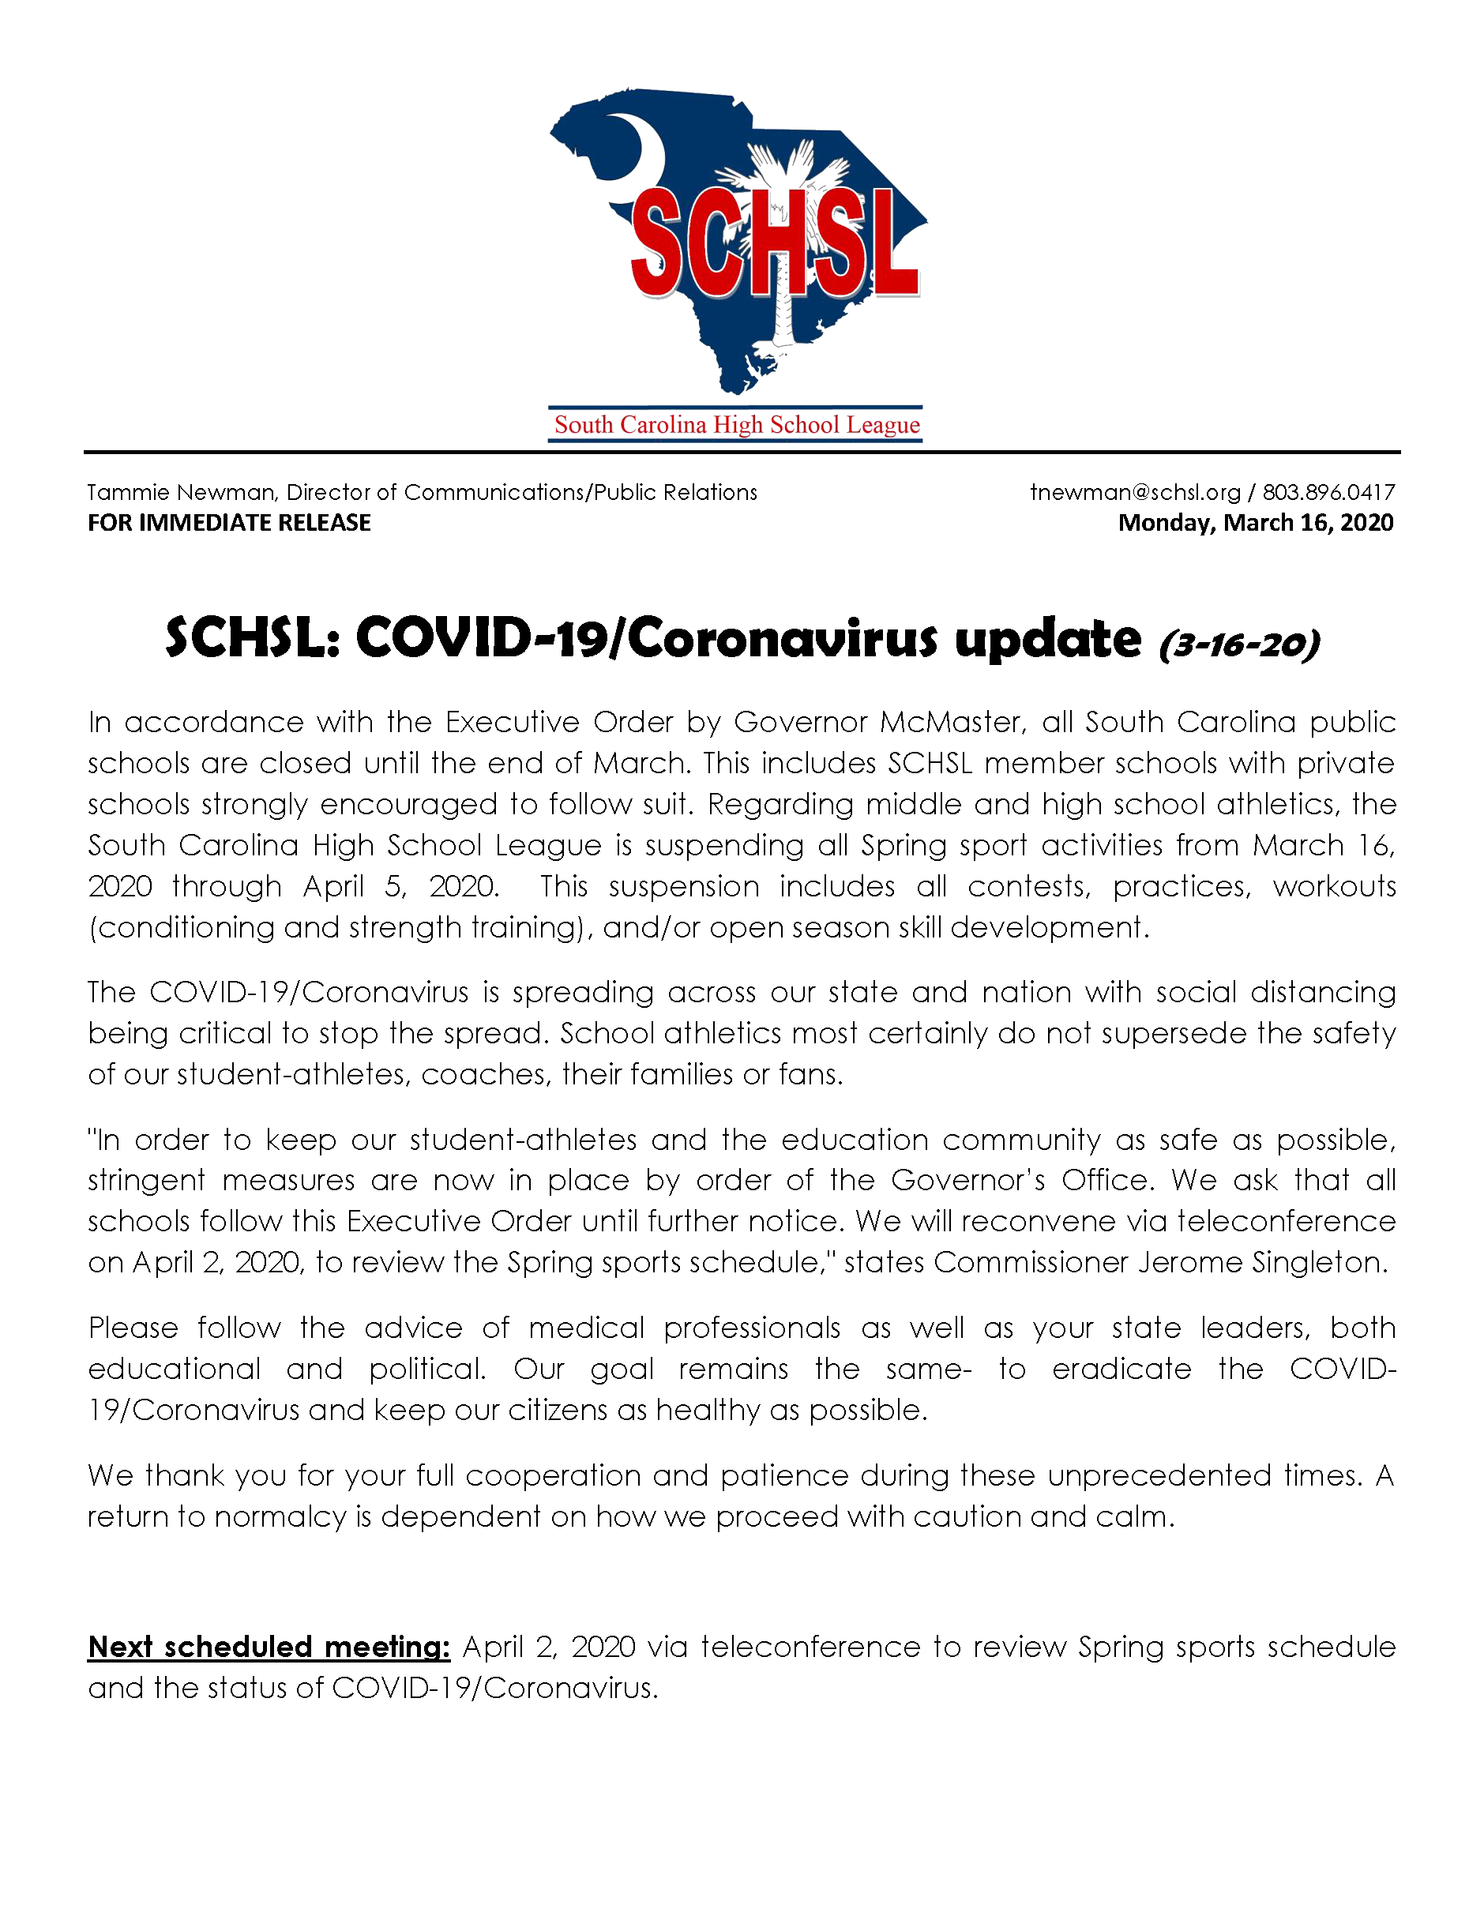 SCHL Spring sports canceled